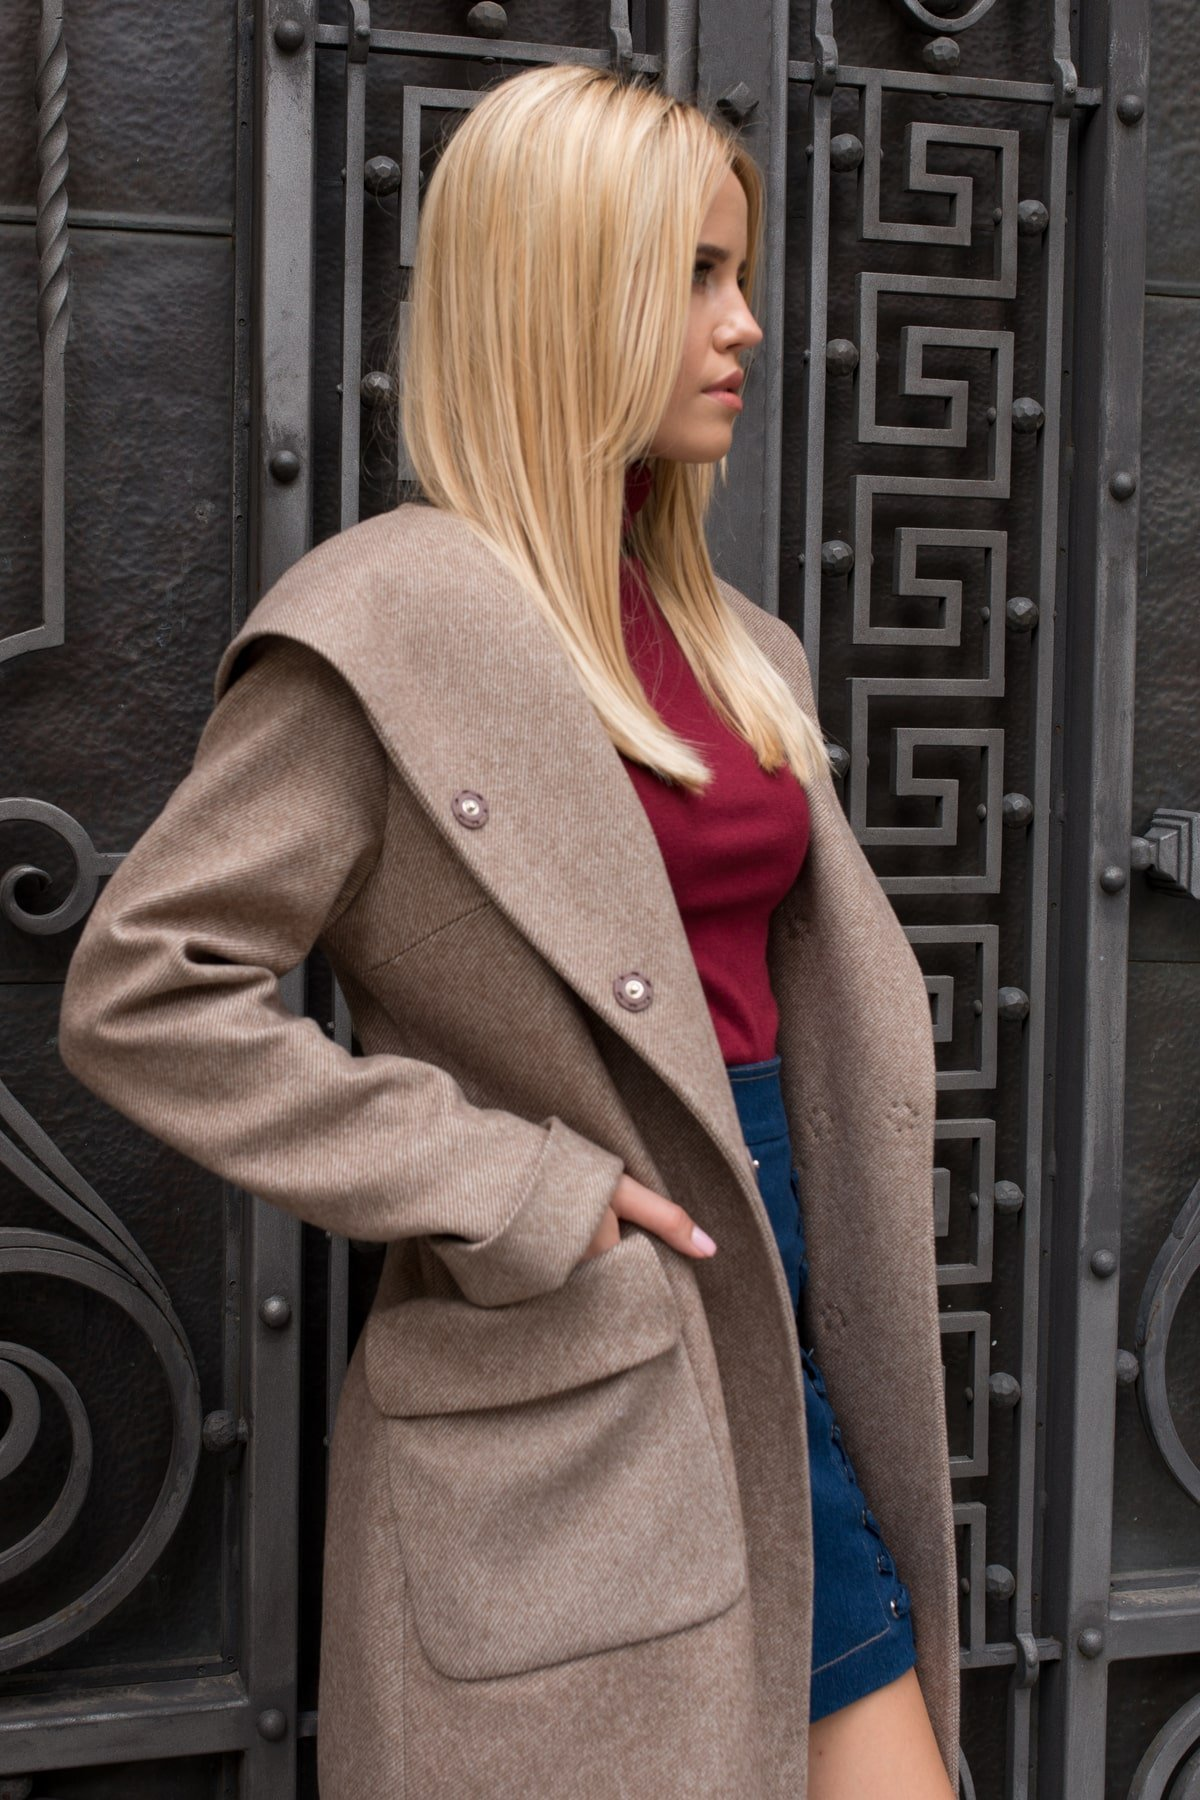 Пальто Анджи 7806 АРТ. 45168 Цвет: Капучино 31 - фото 1, интернет магазин tm-modus.ru